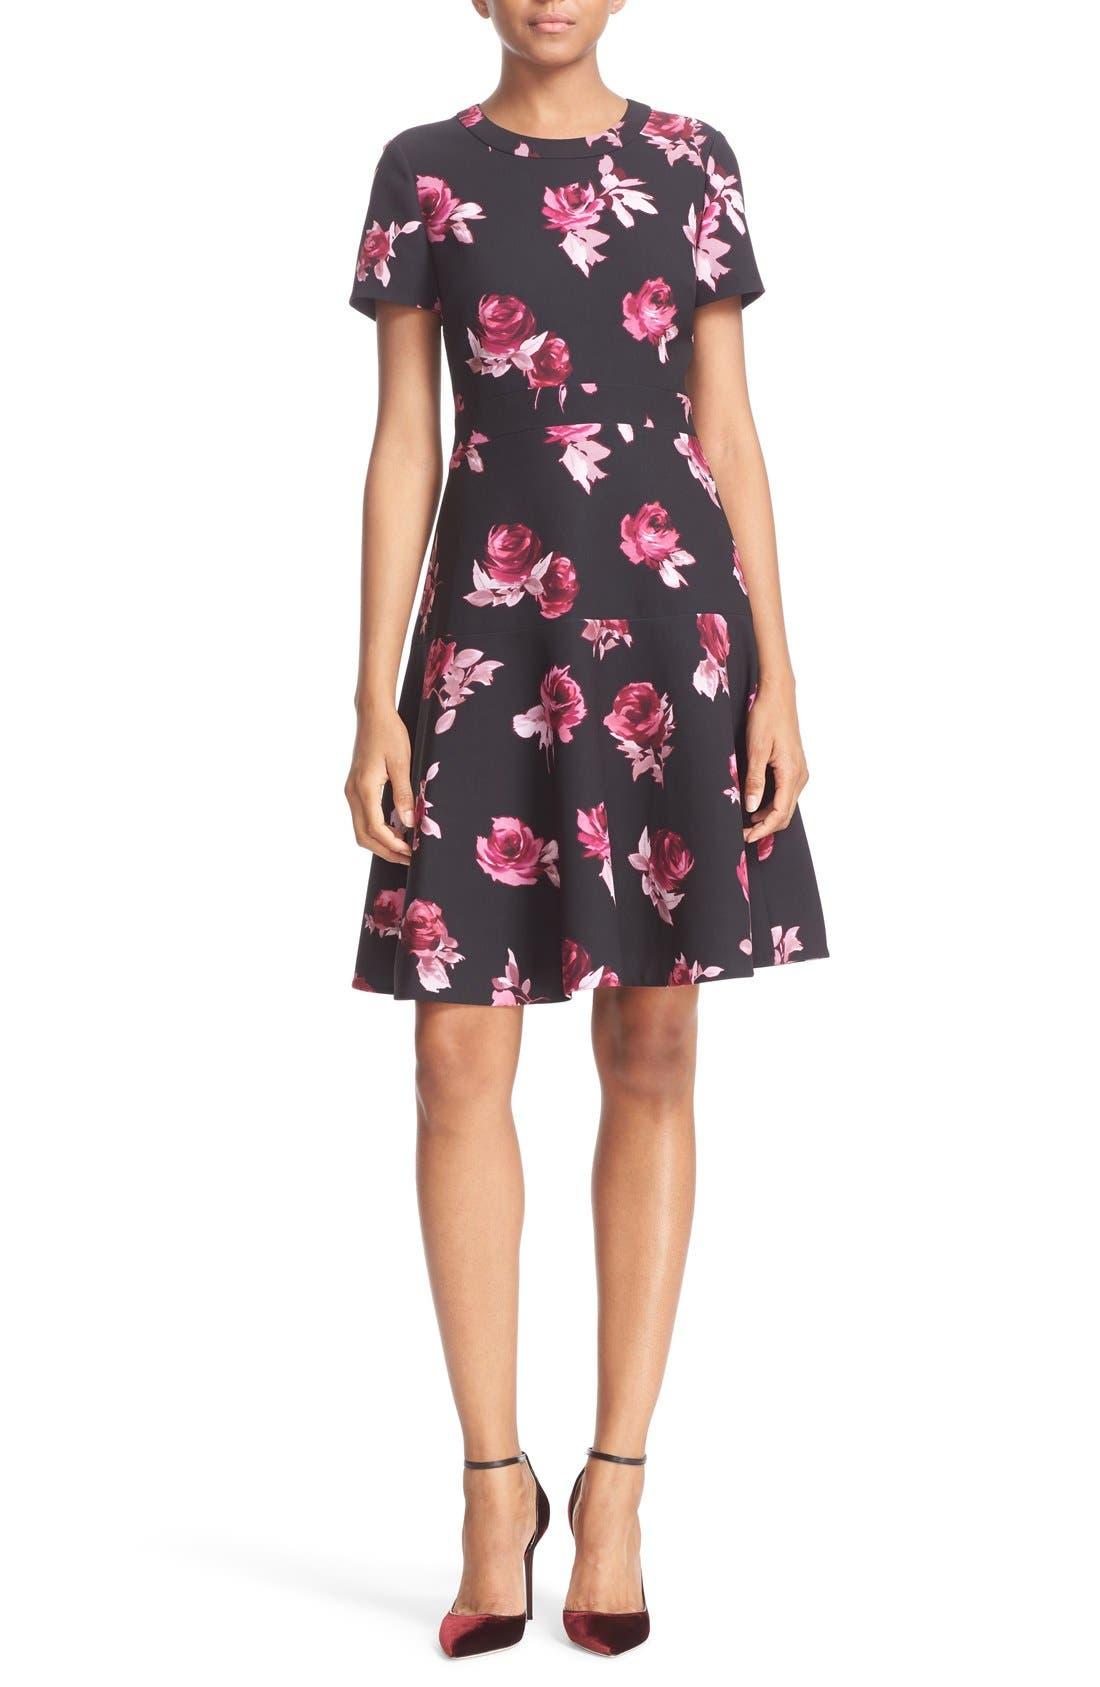 KATE SPADE NEW YORK 'encore rose' crepe fit & flare dress, Main, color, 001